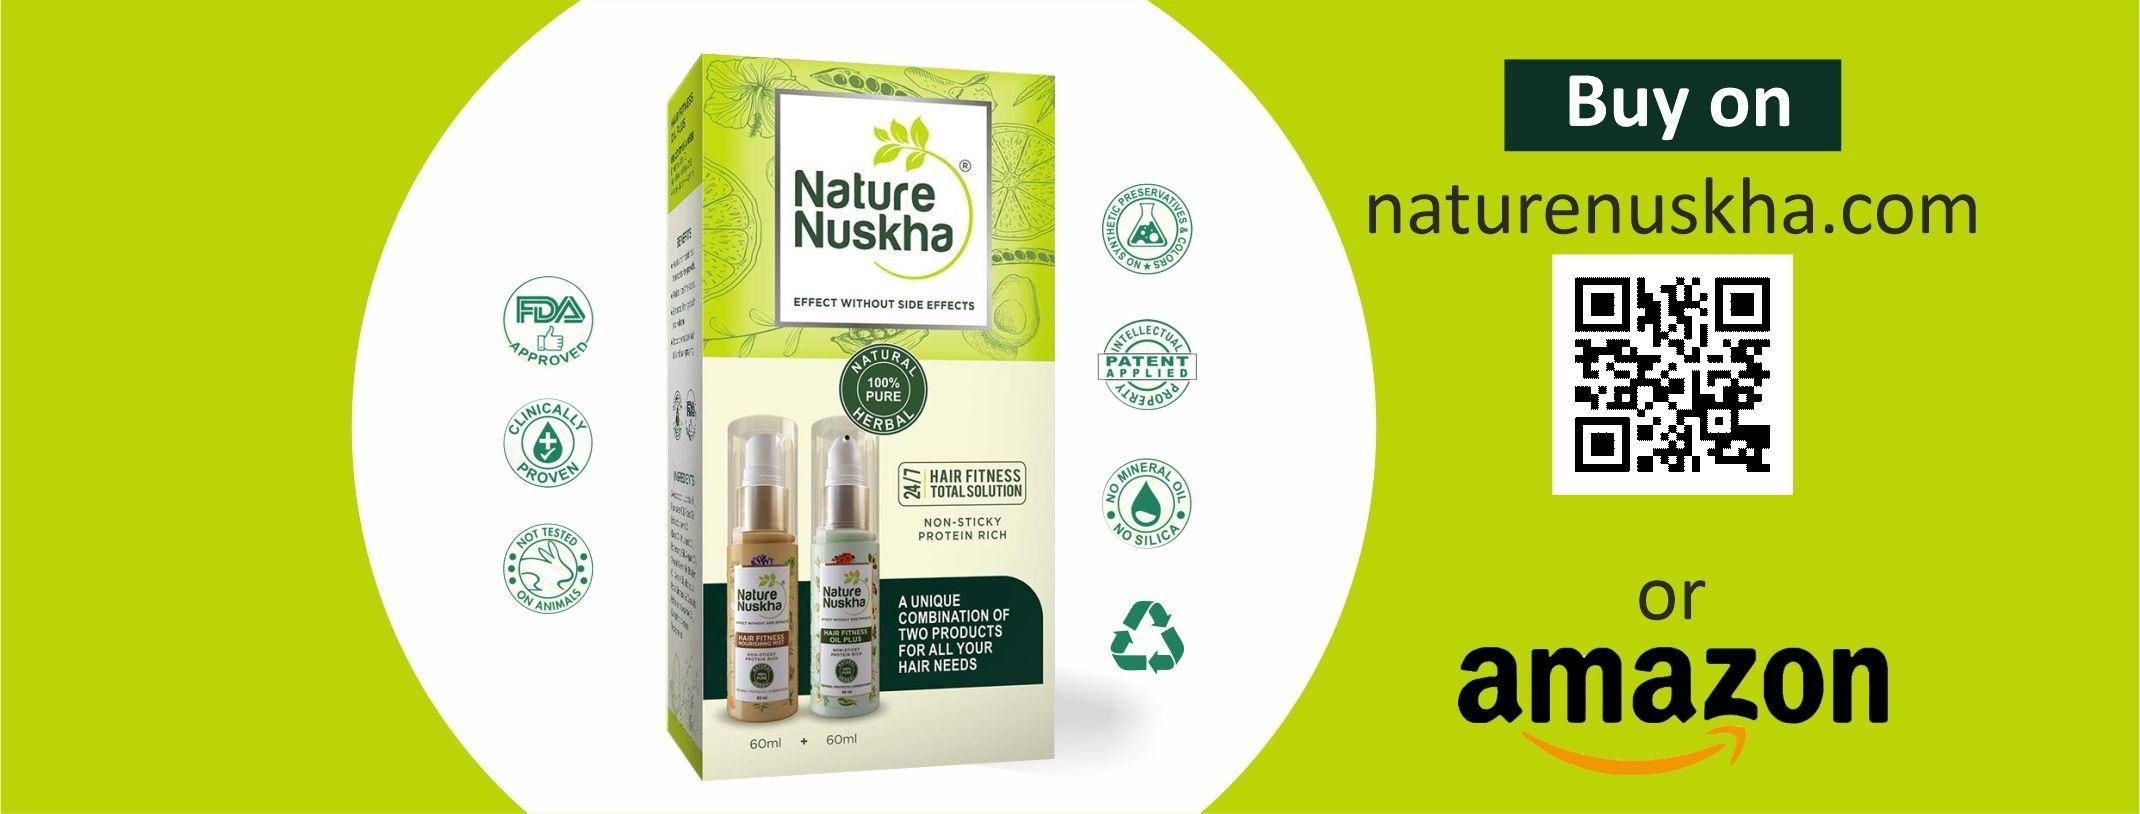 naturenuskha (@naturenuskha) Cover Image